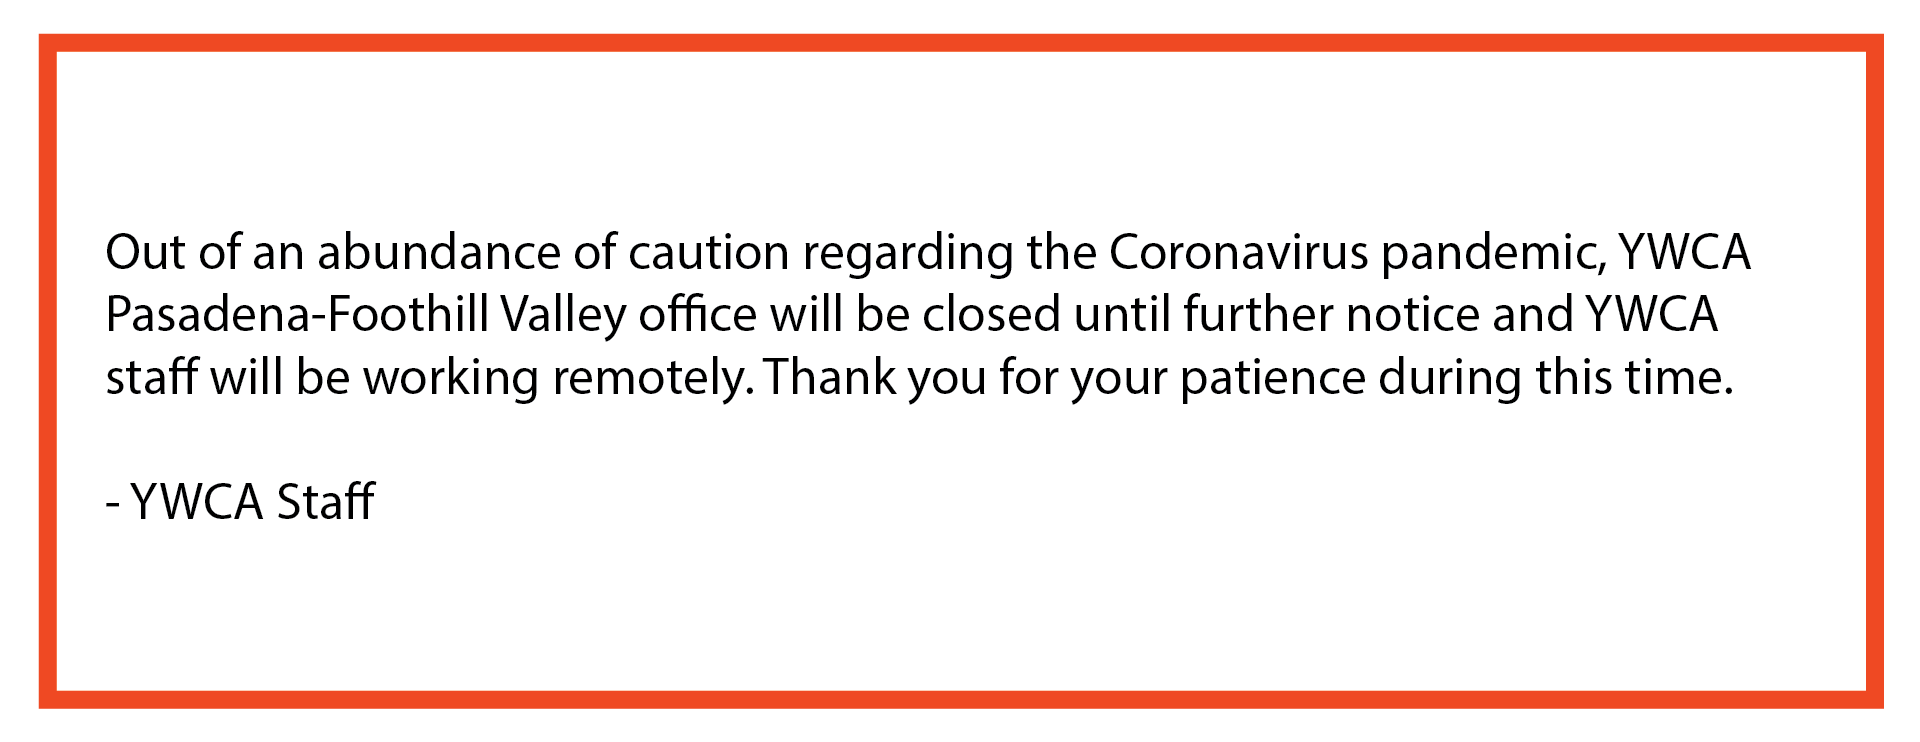 coronavirus-closed indefinitely, working from home